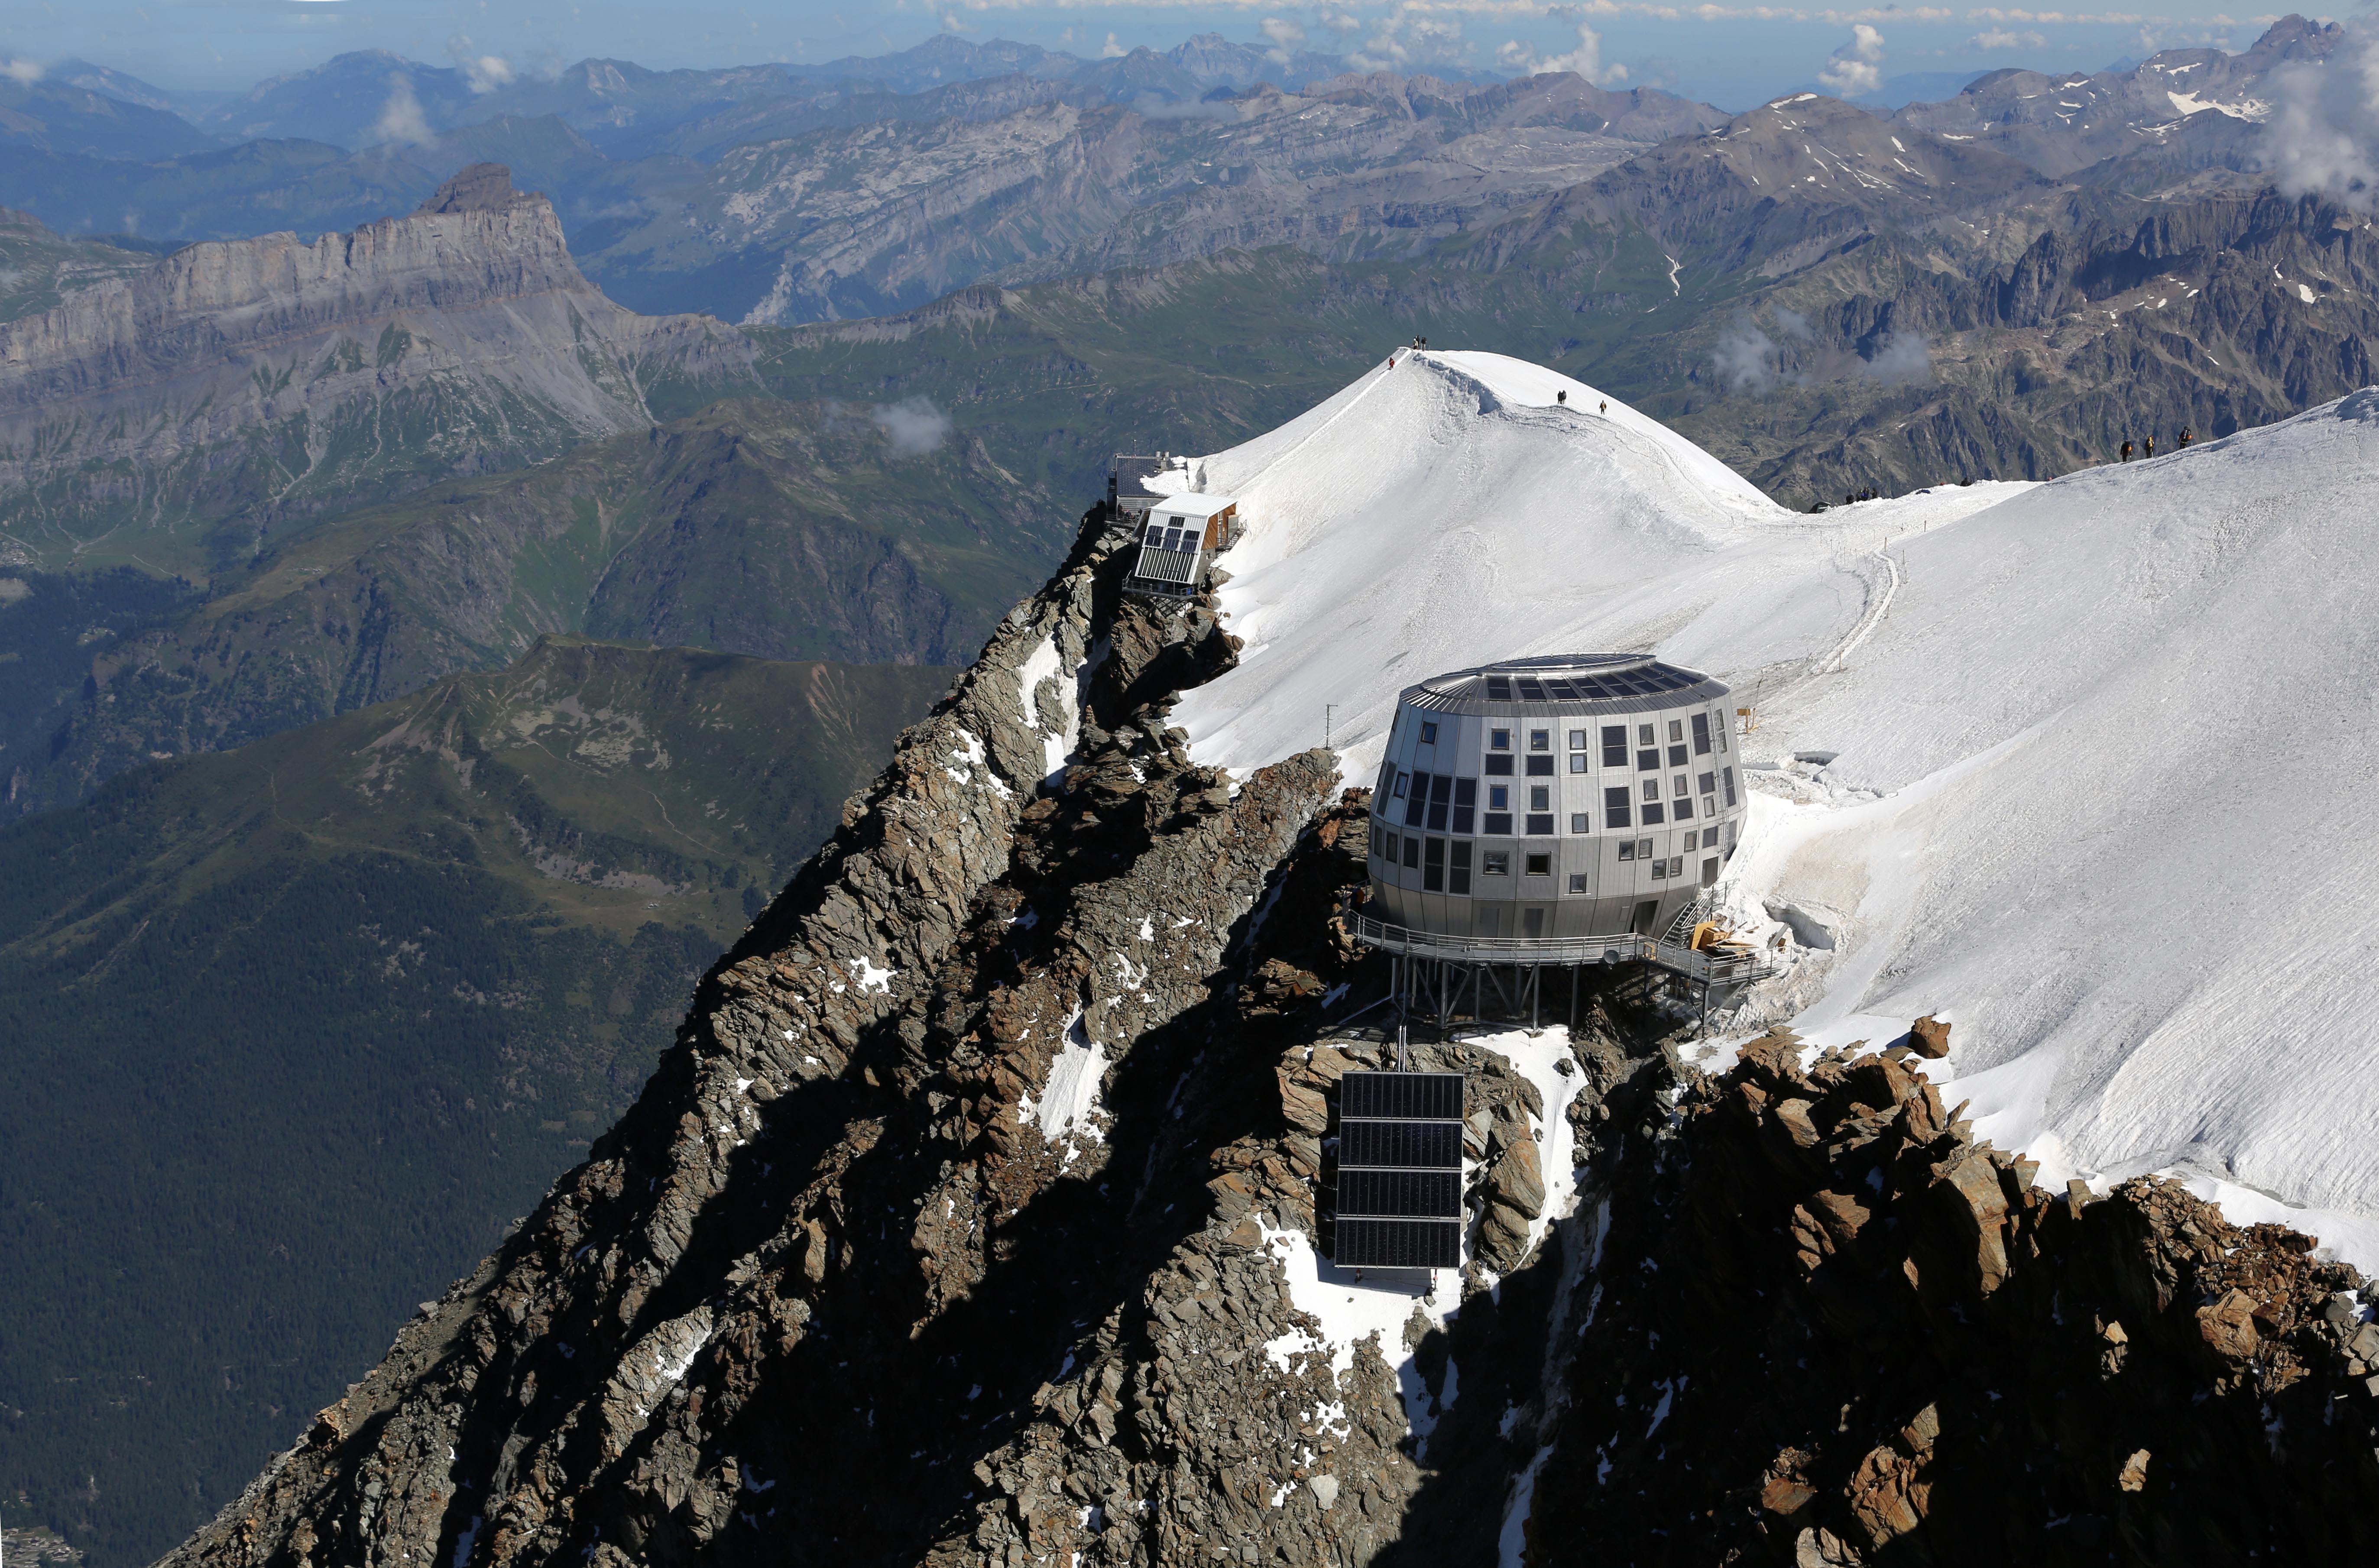 Wallpaper : mountains, snow, winter, France, Alps, walking, summit ...